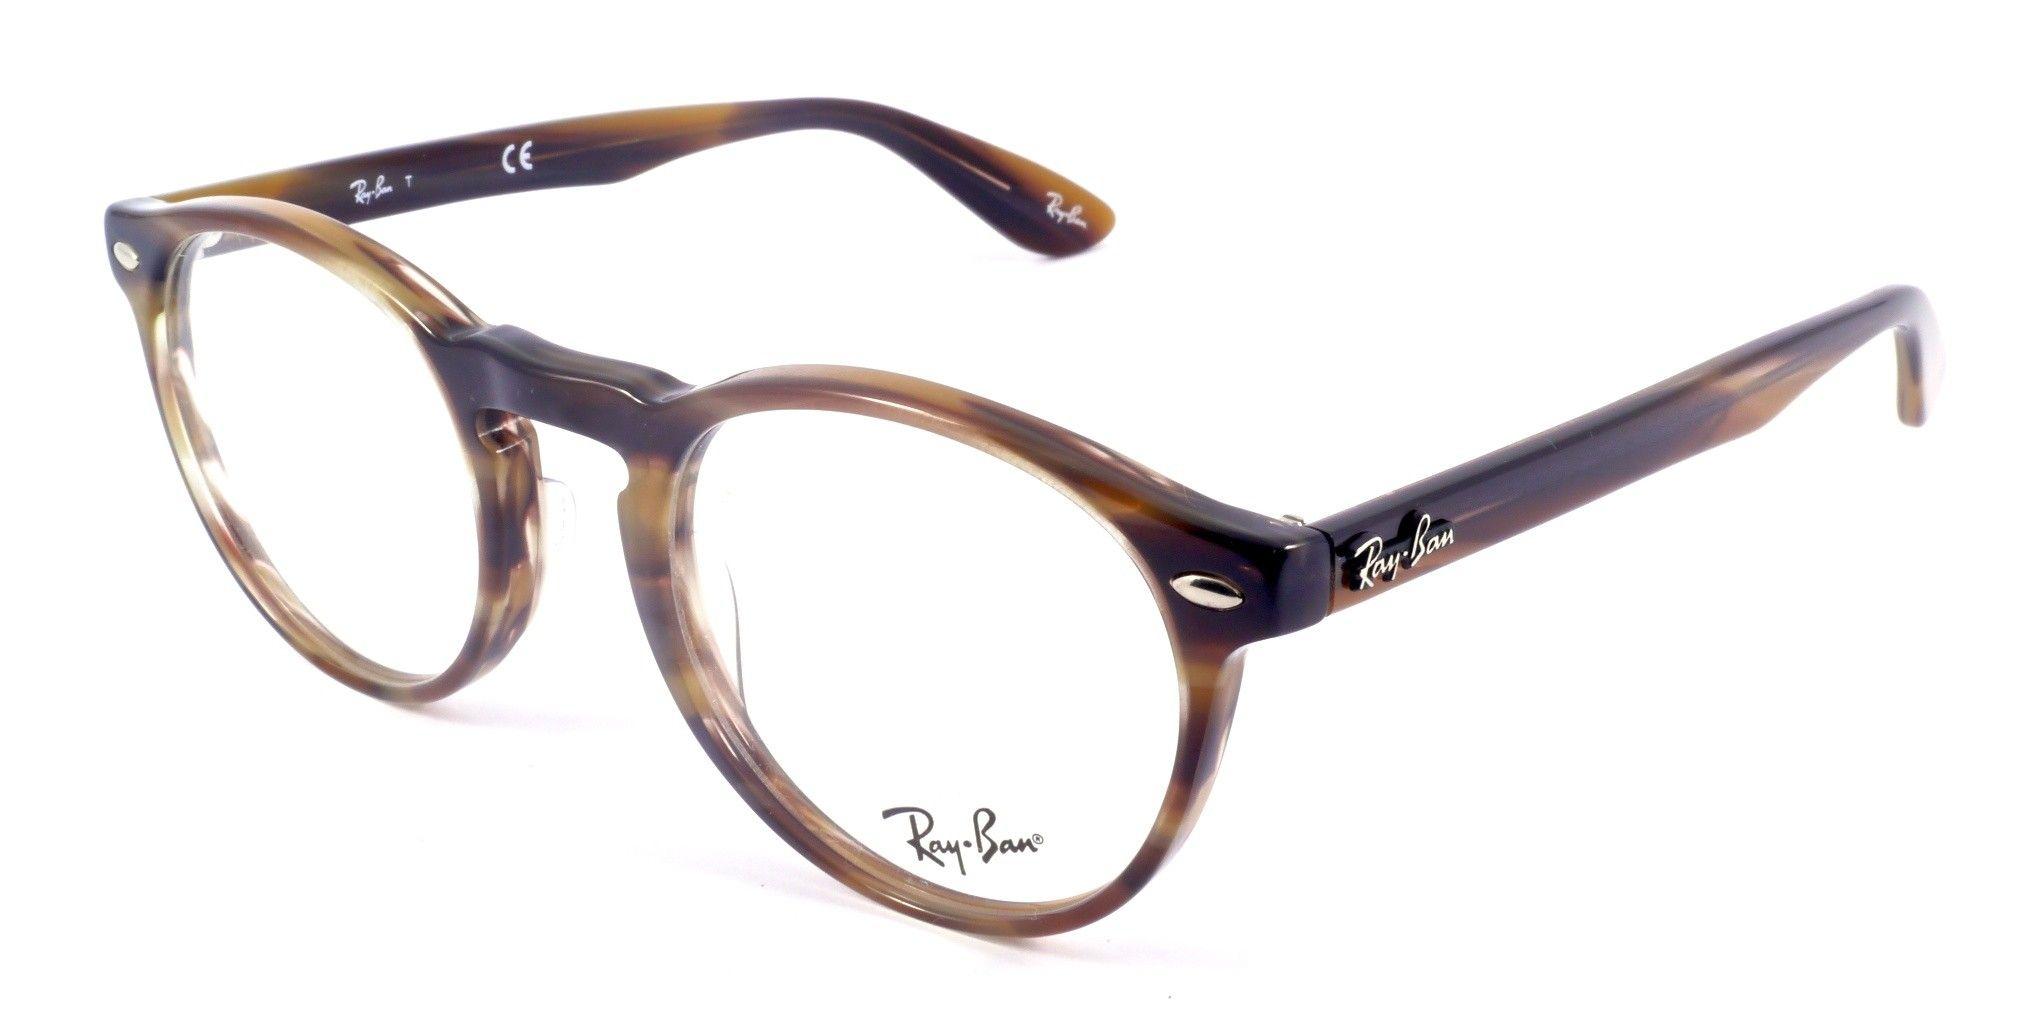 Lunettes de vue Ray Ban   Mi Estilo   Eyeglasses, Glasses, Ray bans ce83dabf7c47